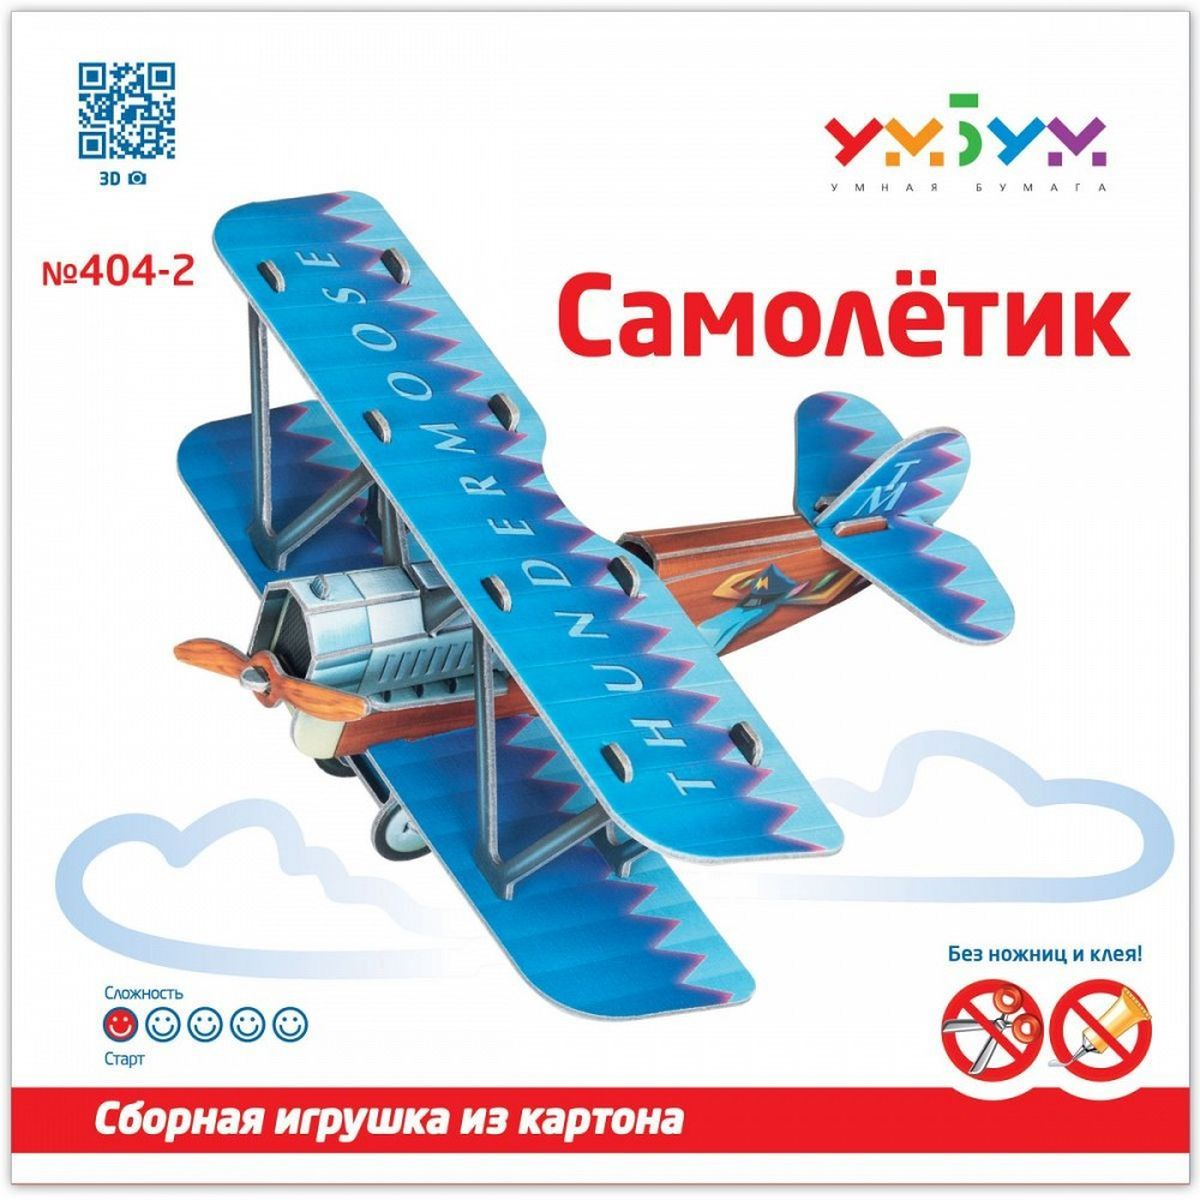 Умная бумага 3D пазл Самолетик цвет синий